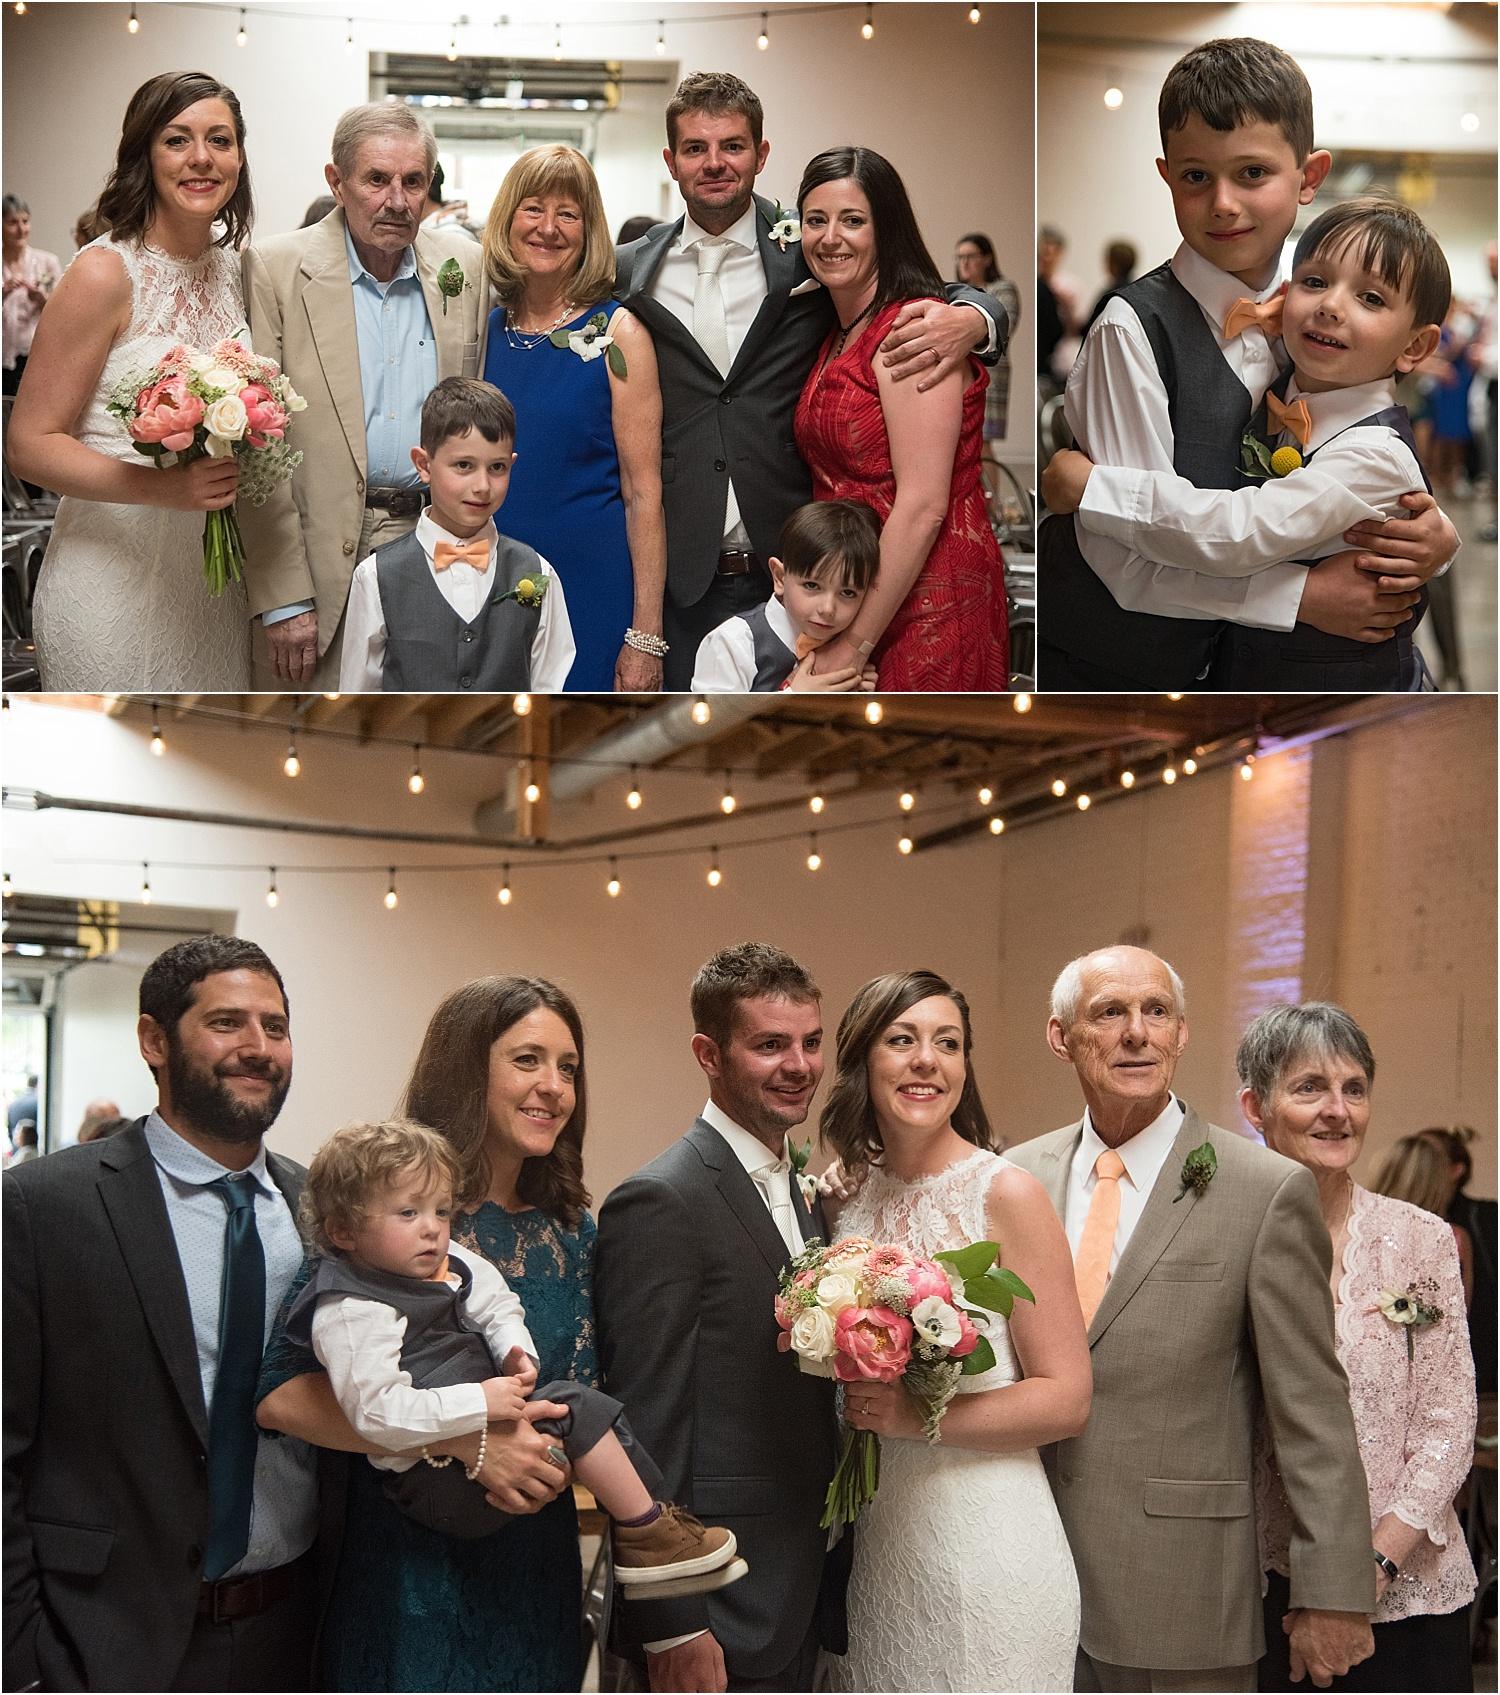 Denver_Wedding_Photography_Skylight_Urban_Venue_Modern_Bride_035.jpg